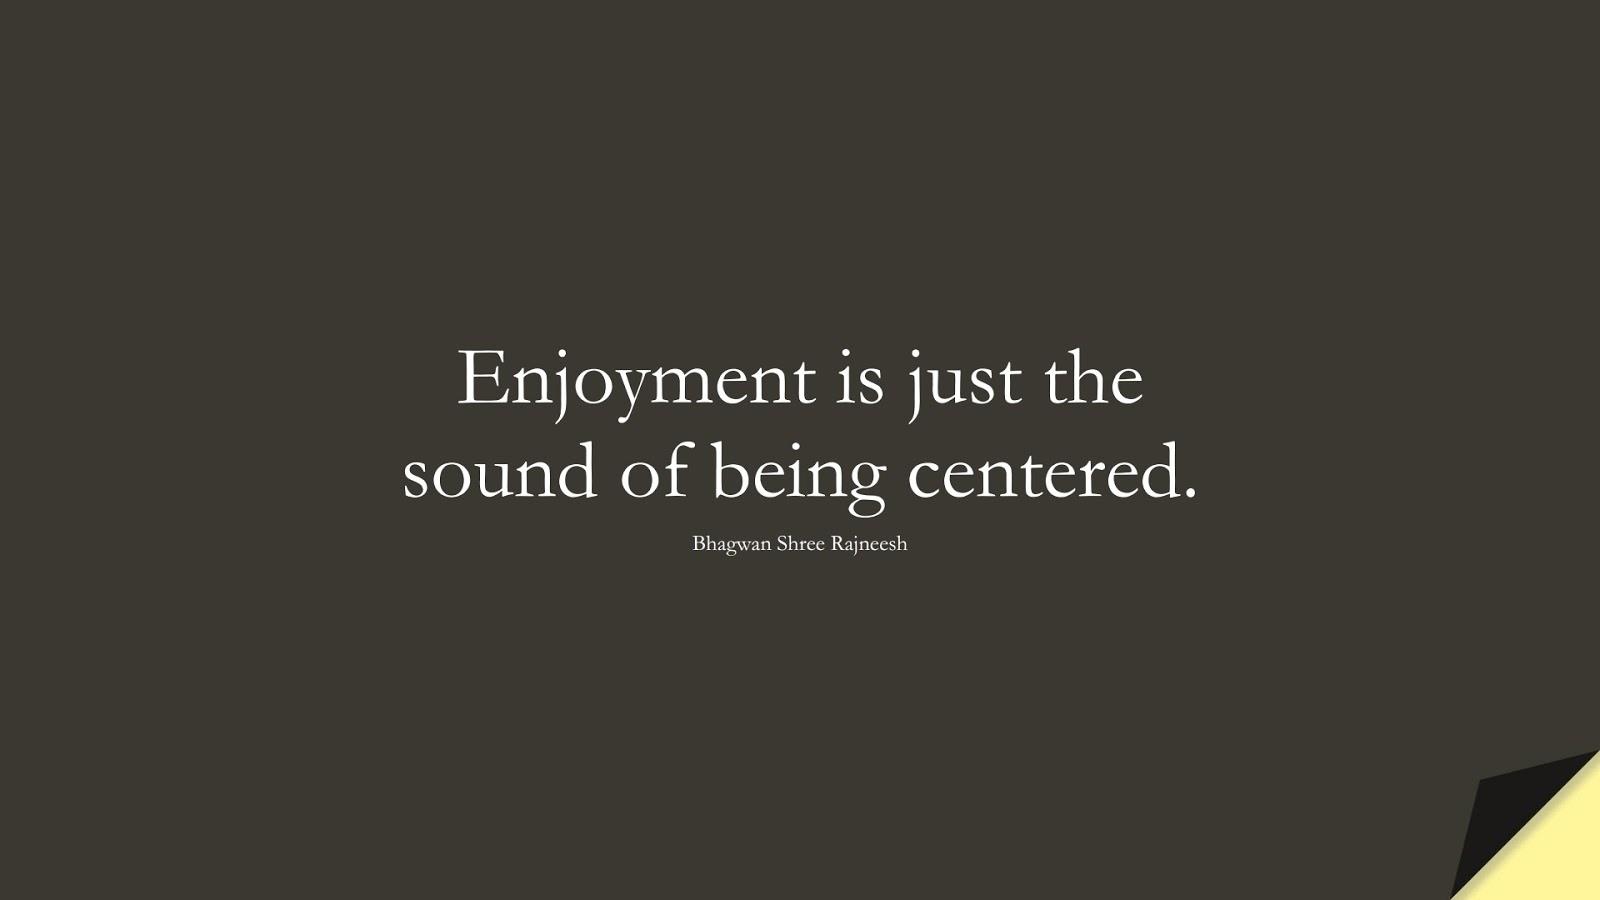 Enjoyment is just the sound of being centered. (Bhagwan Shree Rajneesh);  #HappinessQuotes